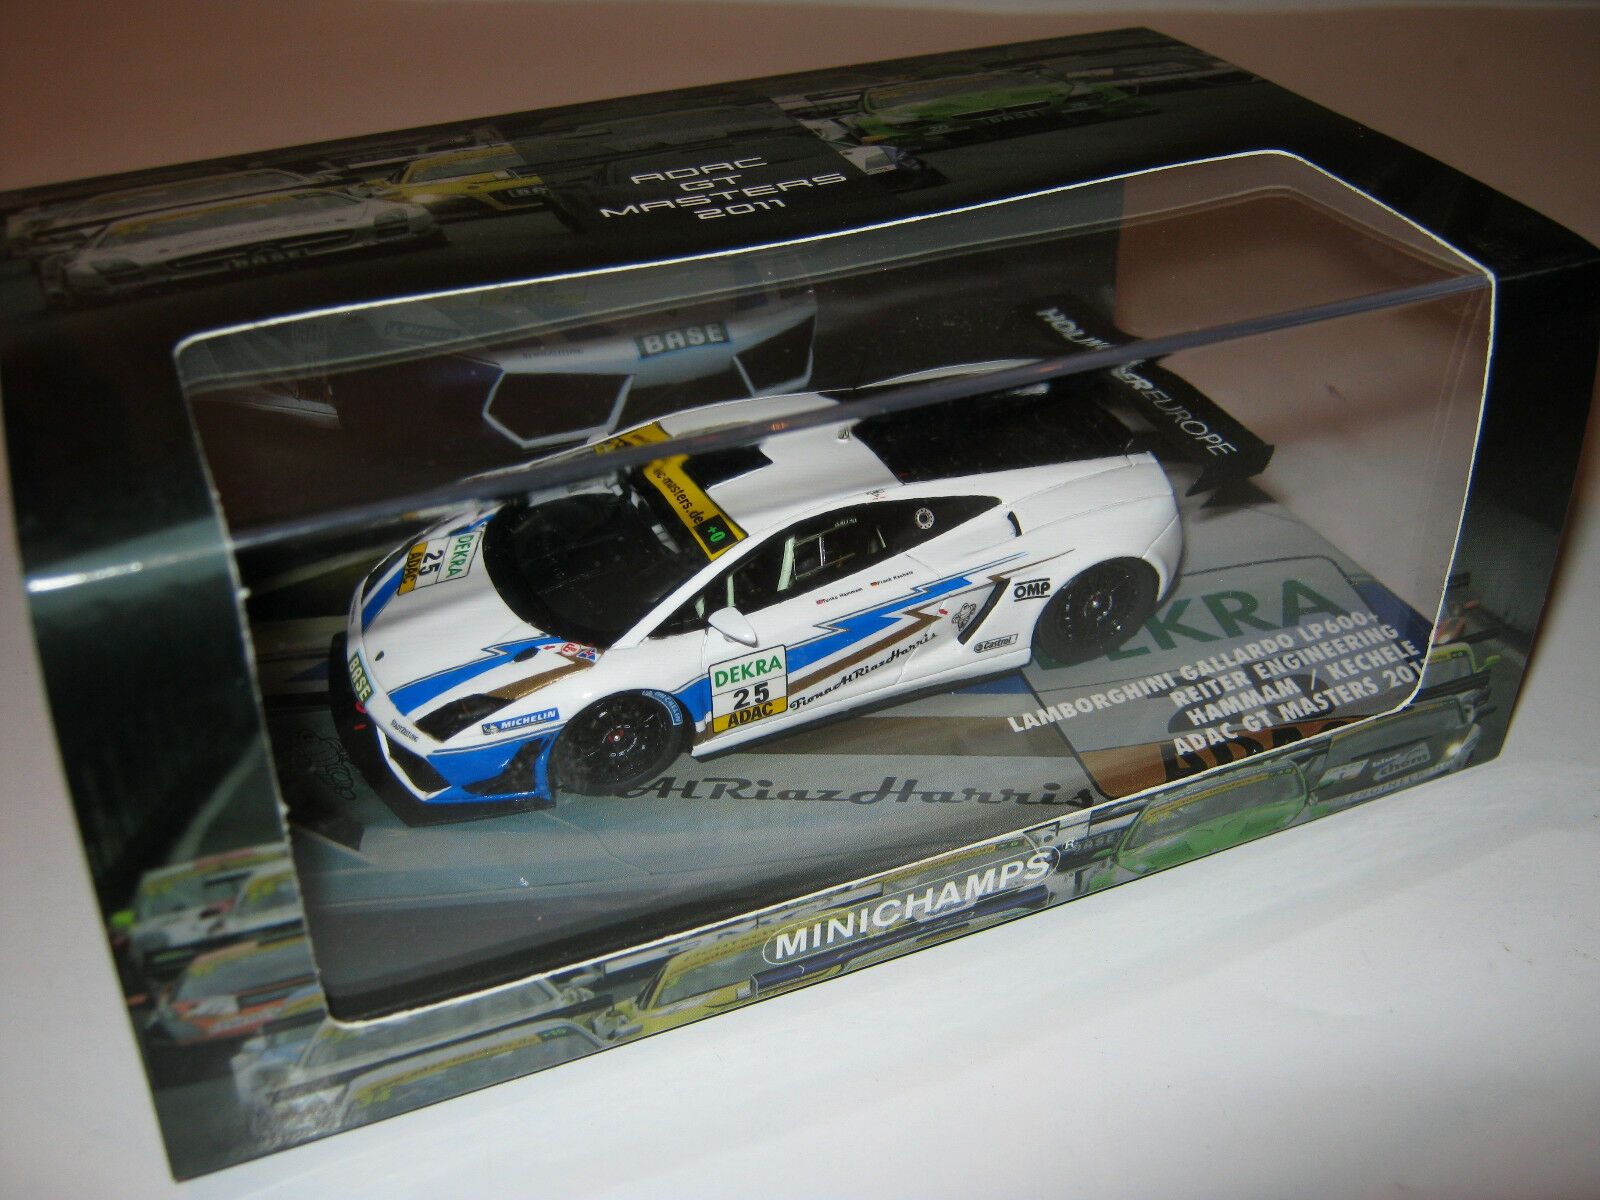 1 43 LAMBORGHINI Gallardo lp600 Hammam GT Masters 2011 Minichamps 437111295 New